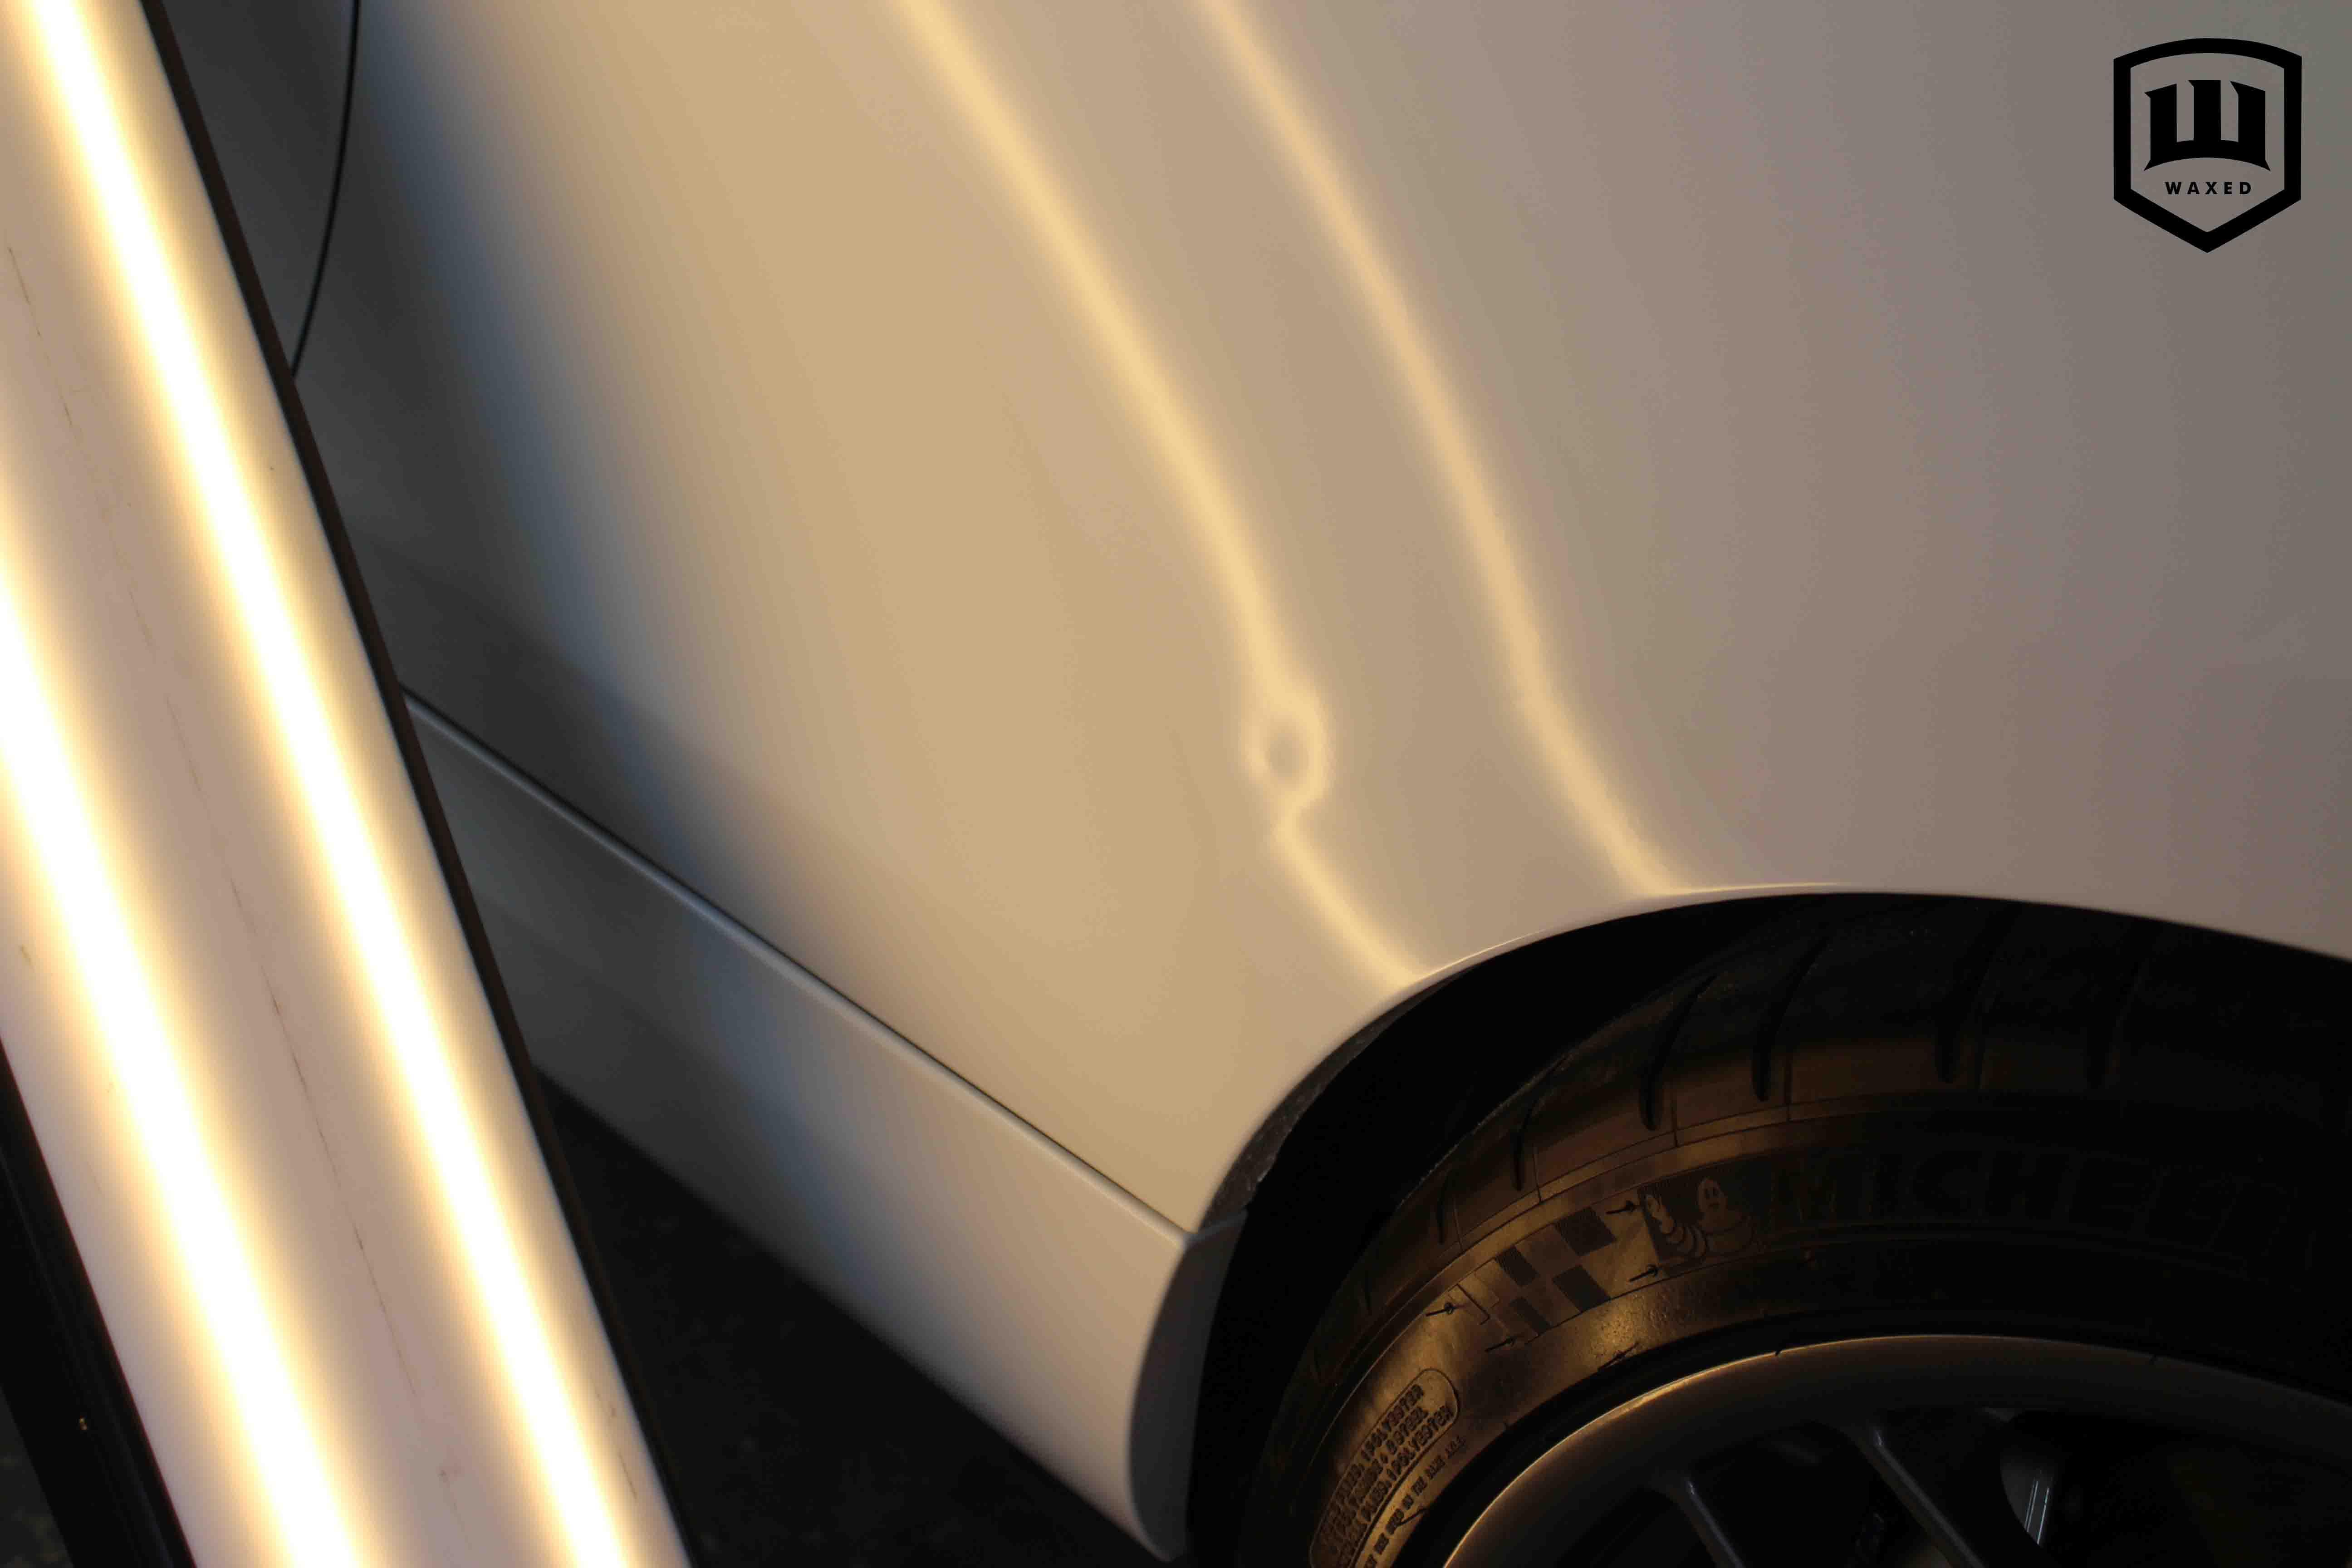 paintless dent repair ottawa ottawa car detailing auto detailing lave auto. Black Bedroom Furniture Sets. Home Design Ideas